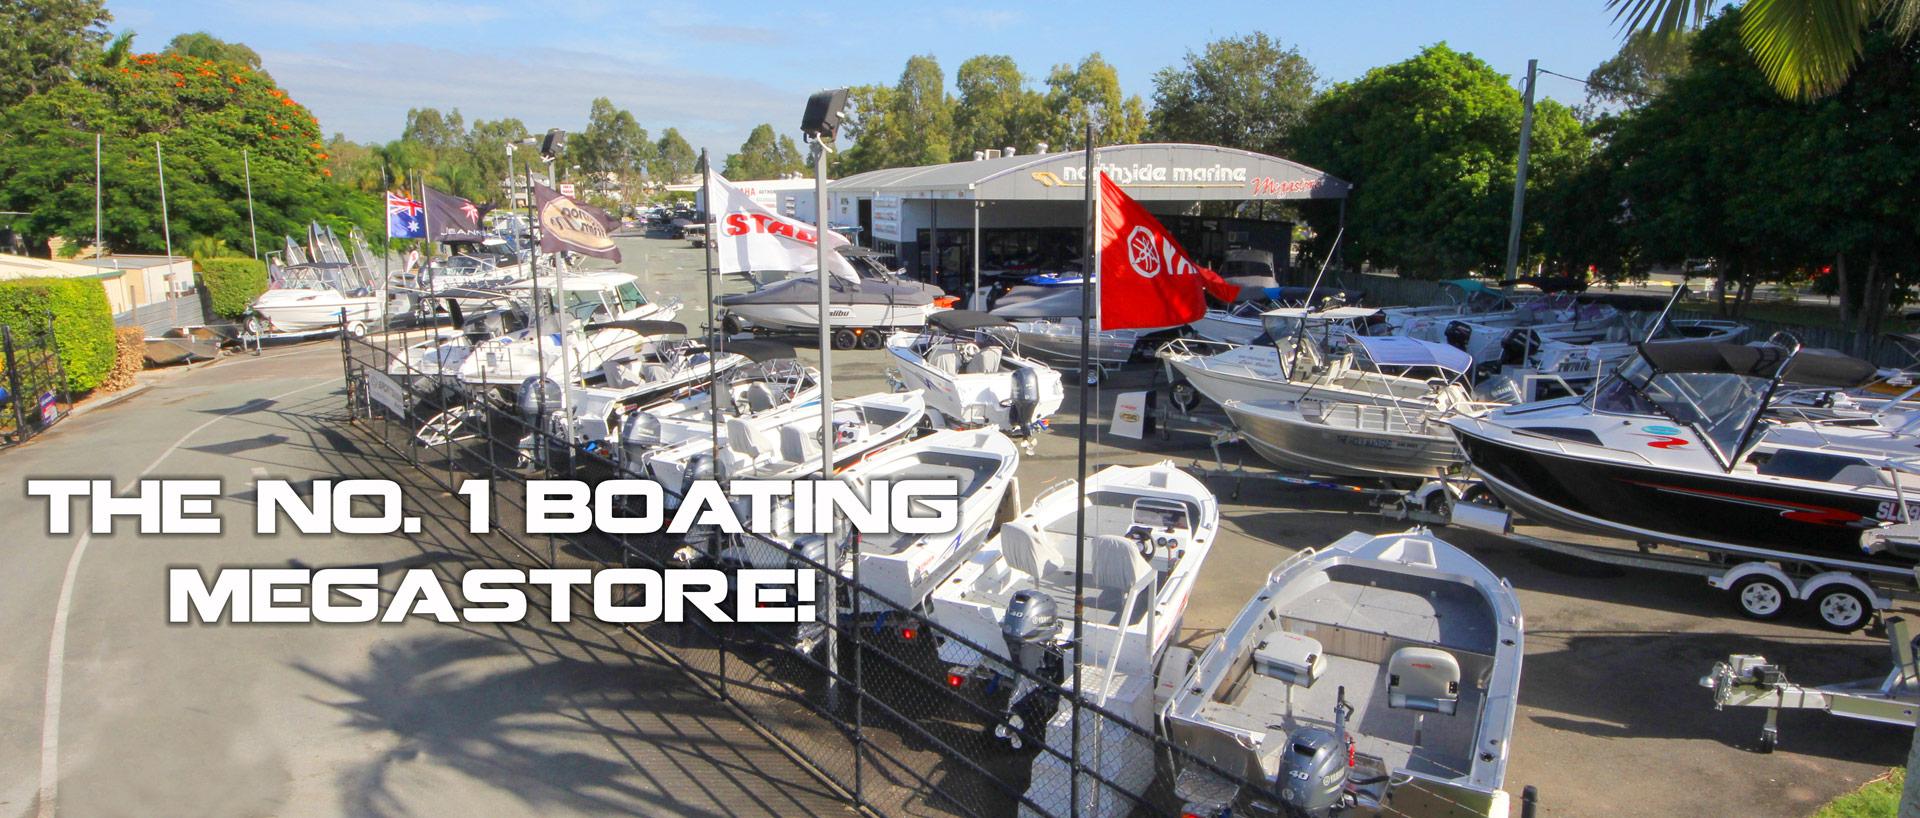 northside-marine-boating-mega-store